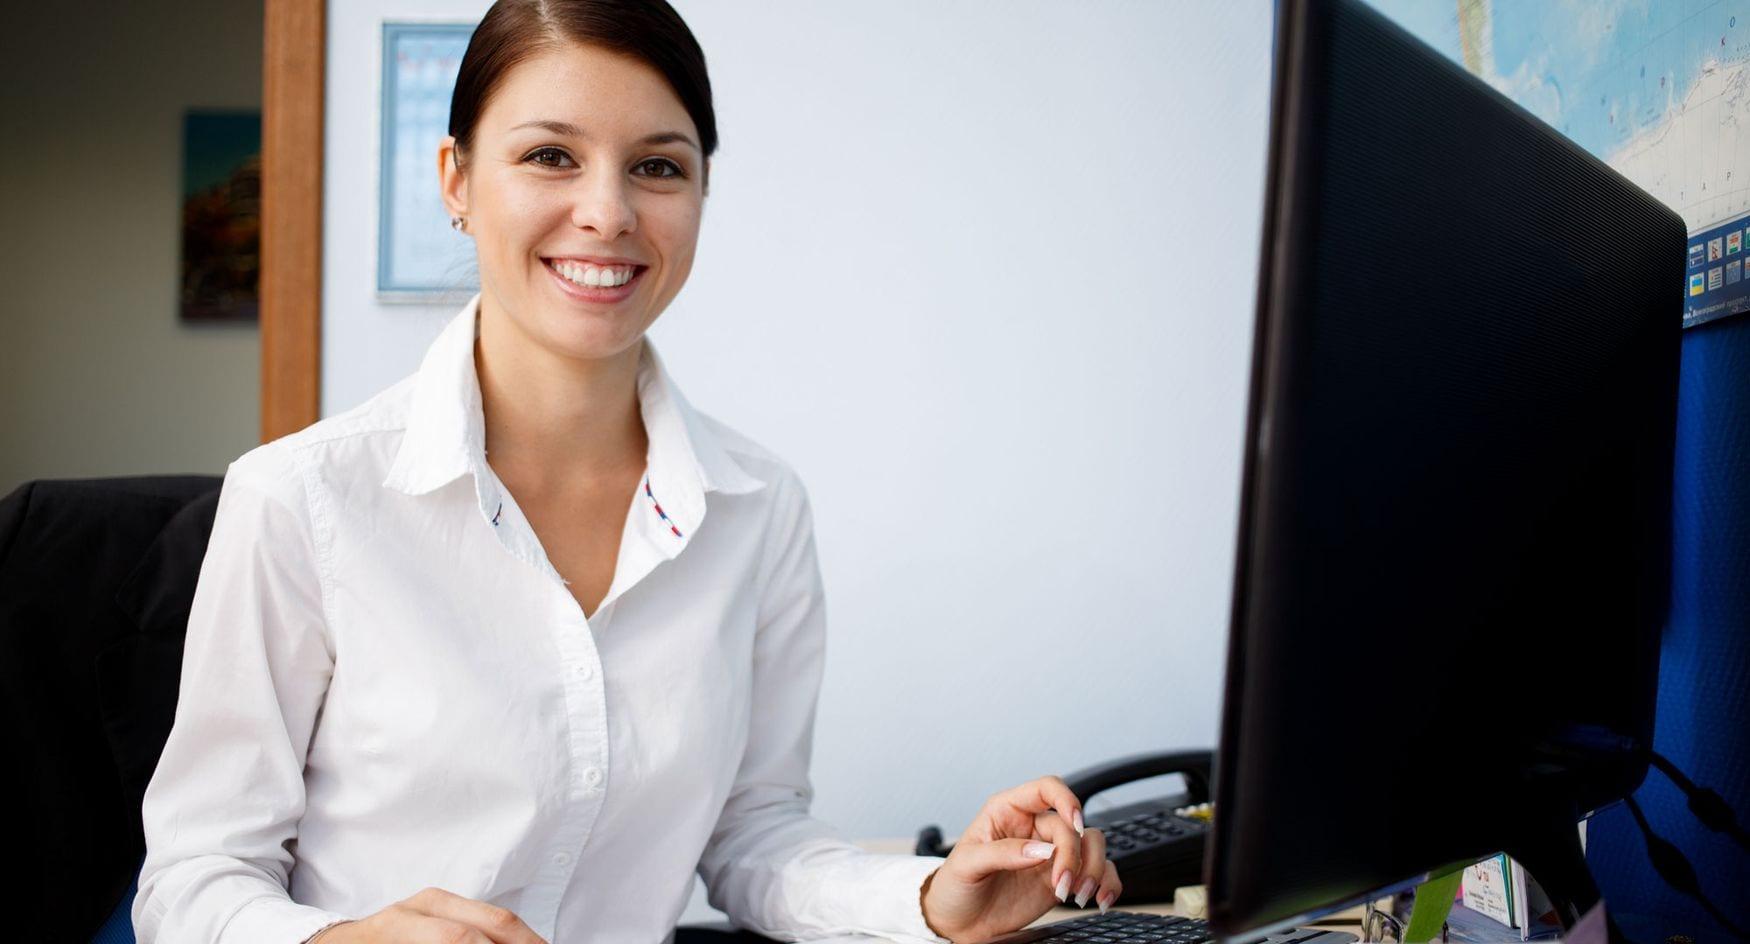 medical billing interview preparation part laurus college medical billing interview preparation part 1